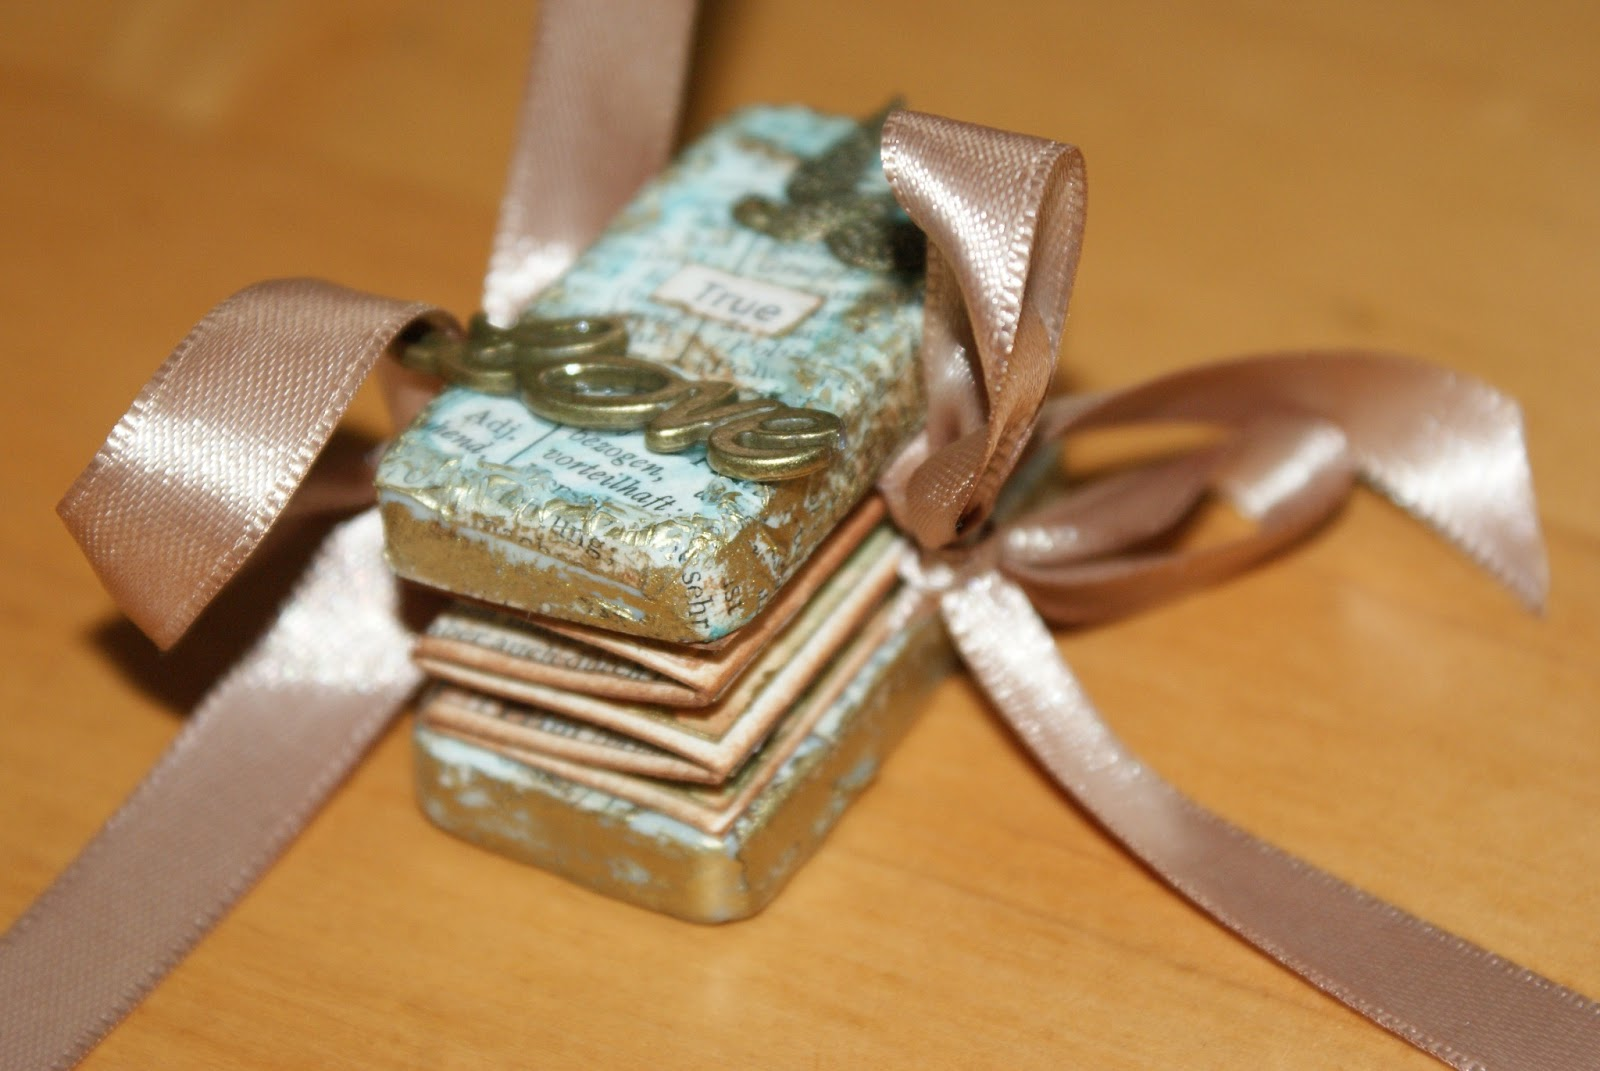 vampirschmetterlings basteleck valentinstags geschenk. Black Bedroom Furniture Sets. Home Design Ideas